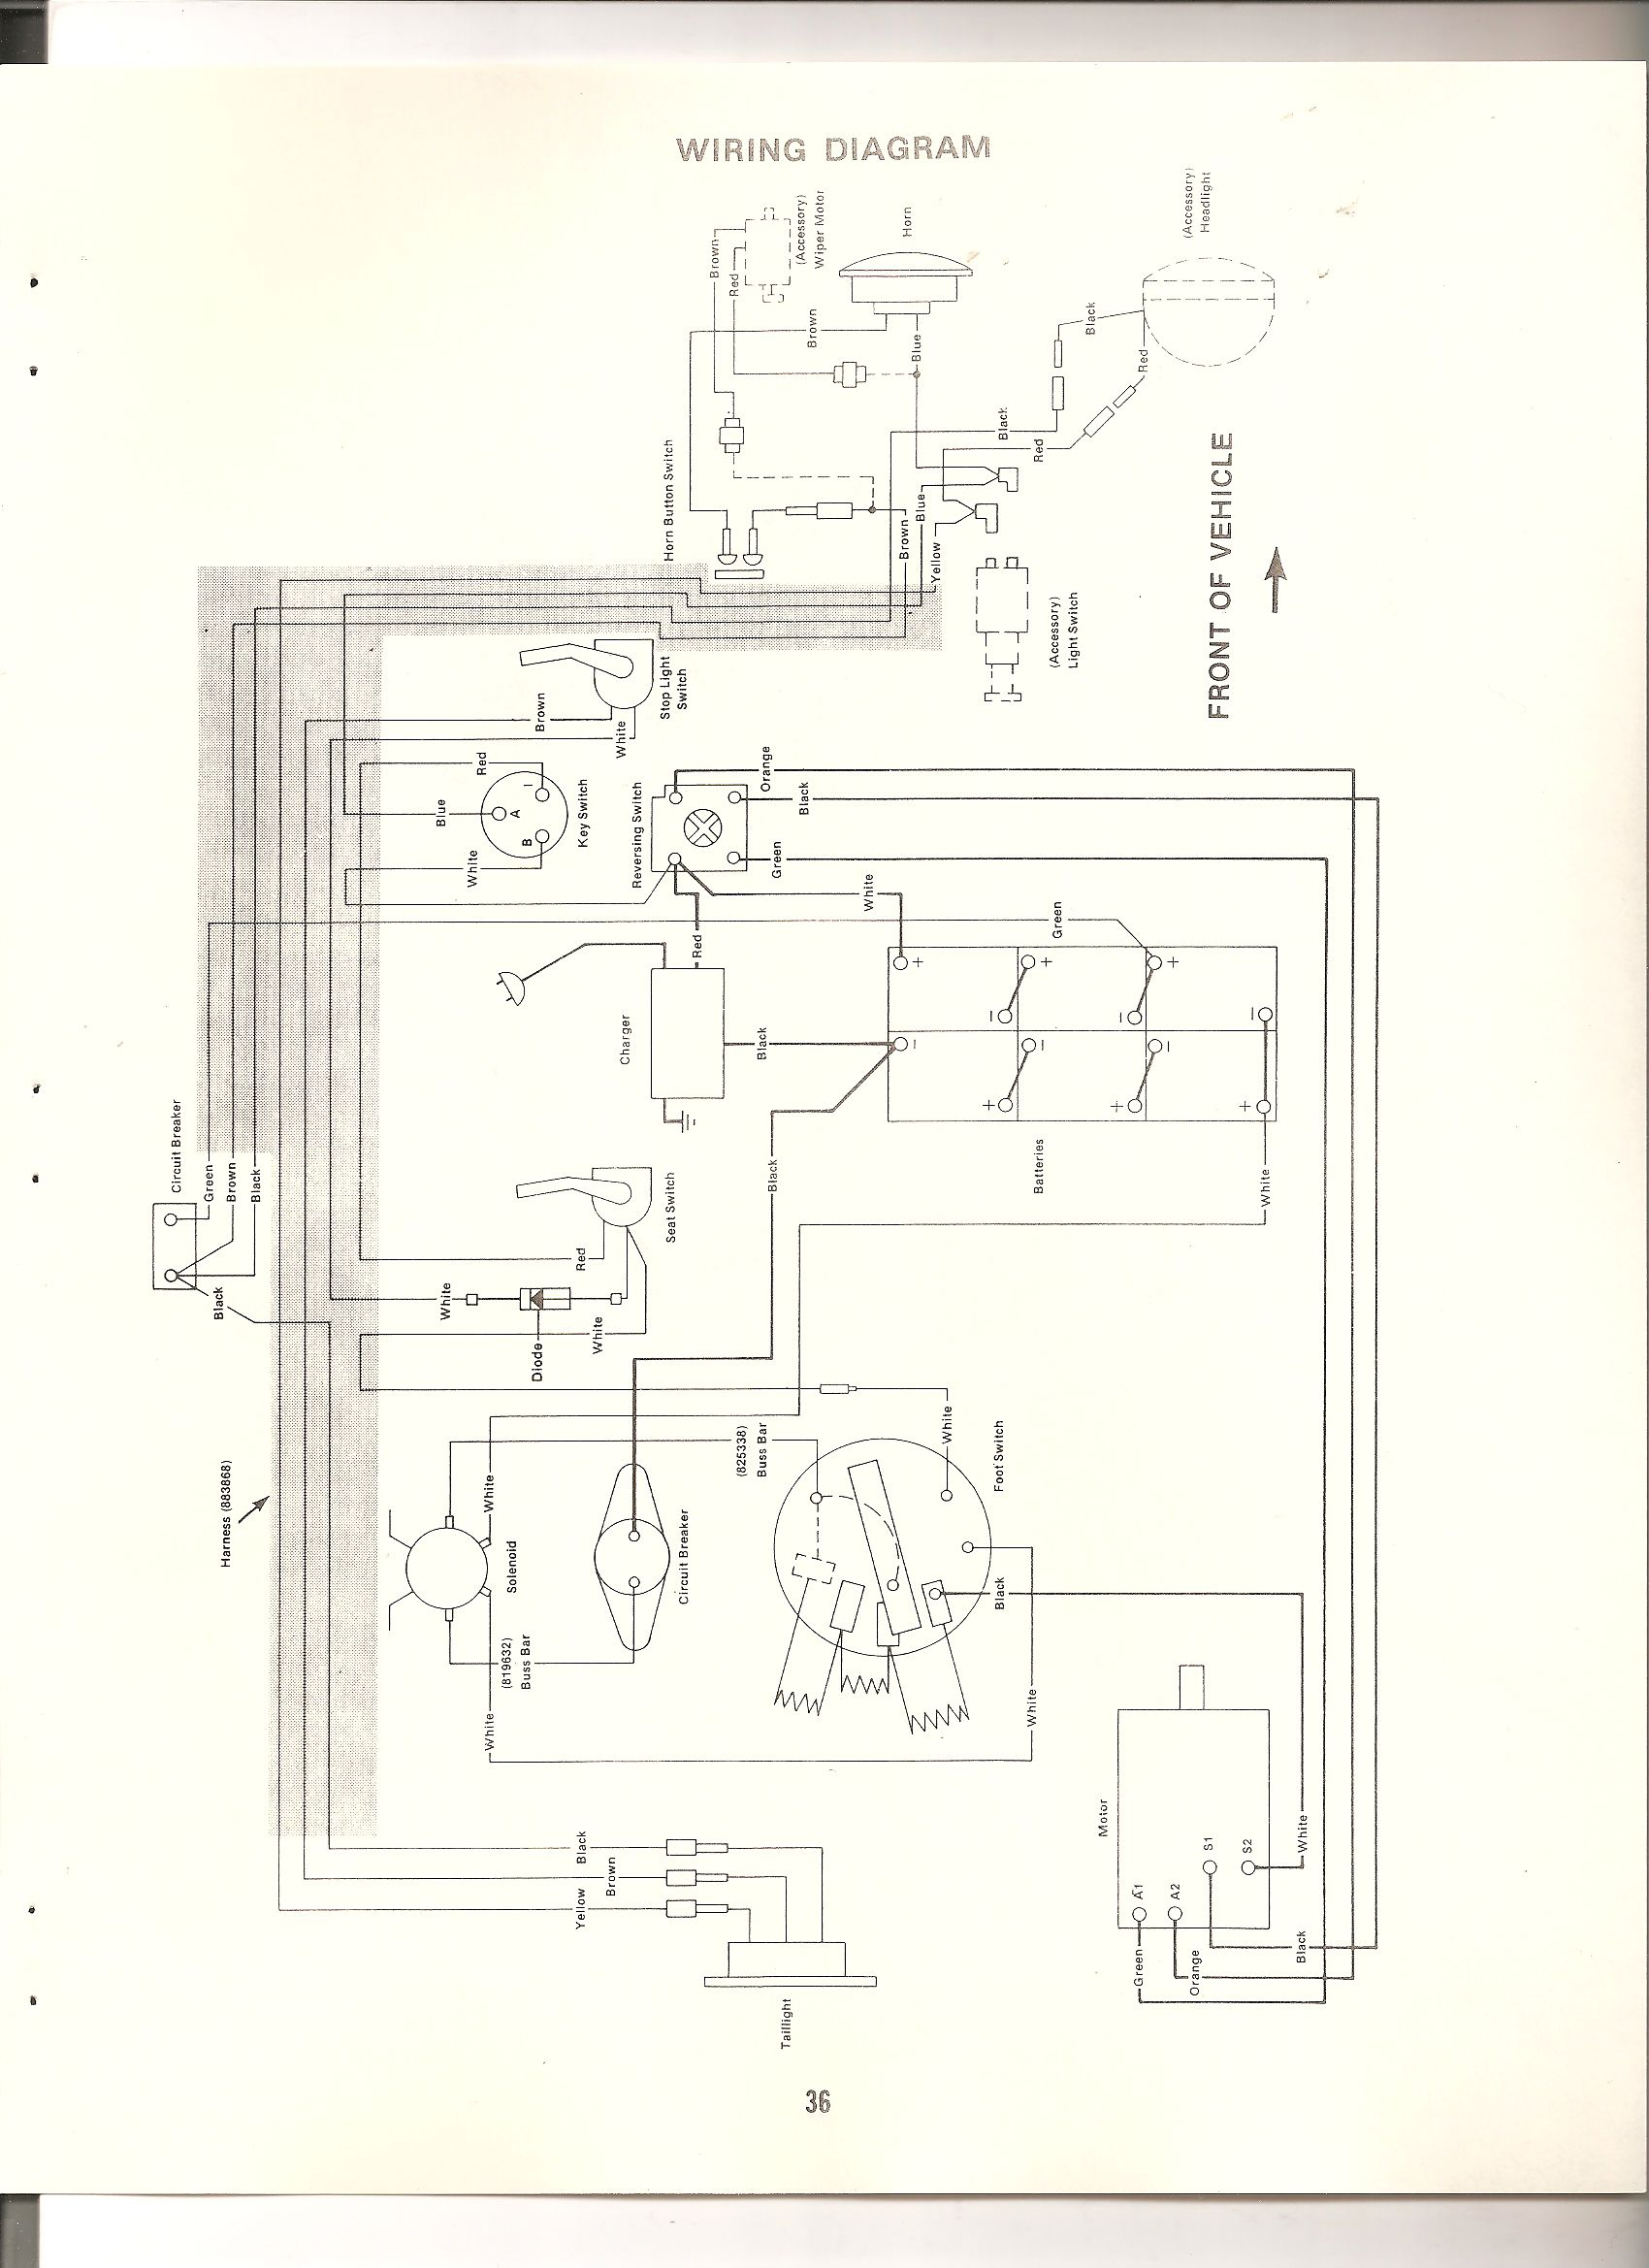 MR_4677] Vintage Golf Cart Wiring DiagramsLectr Antus Mentra Mohammedshrine Librar Wiring 101